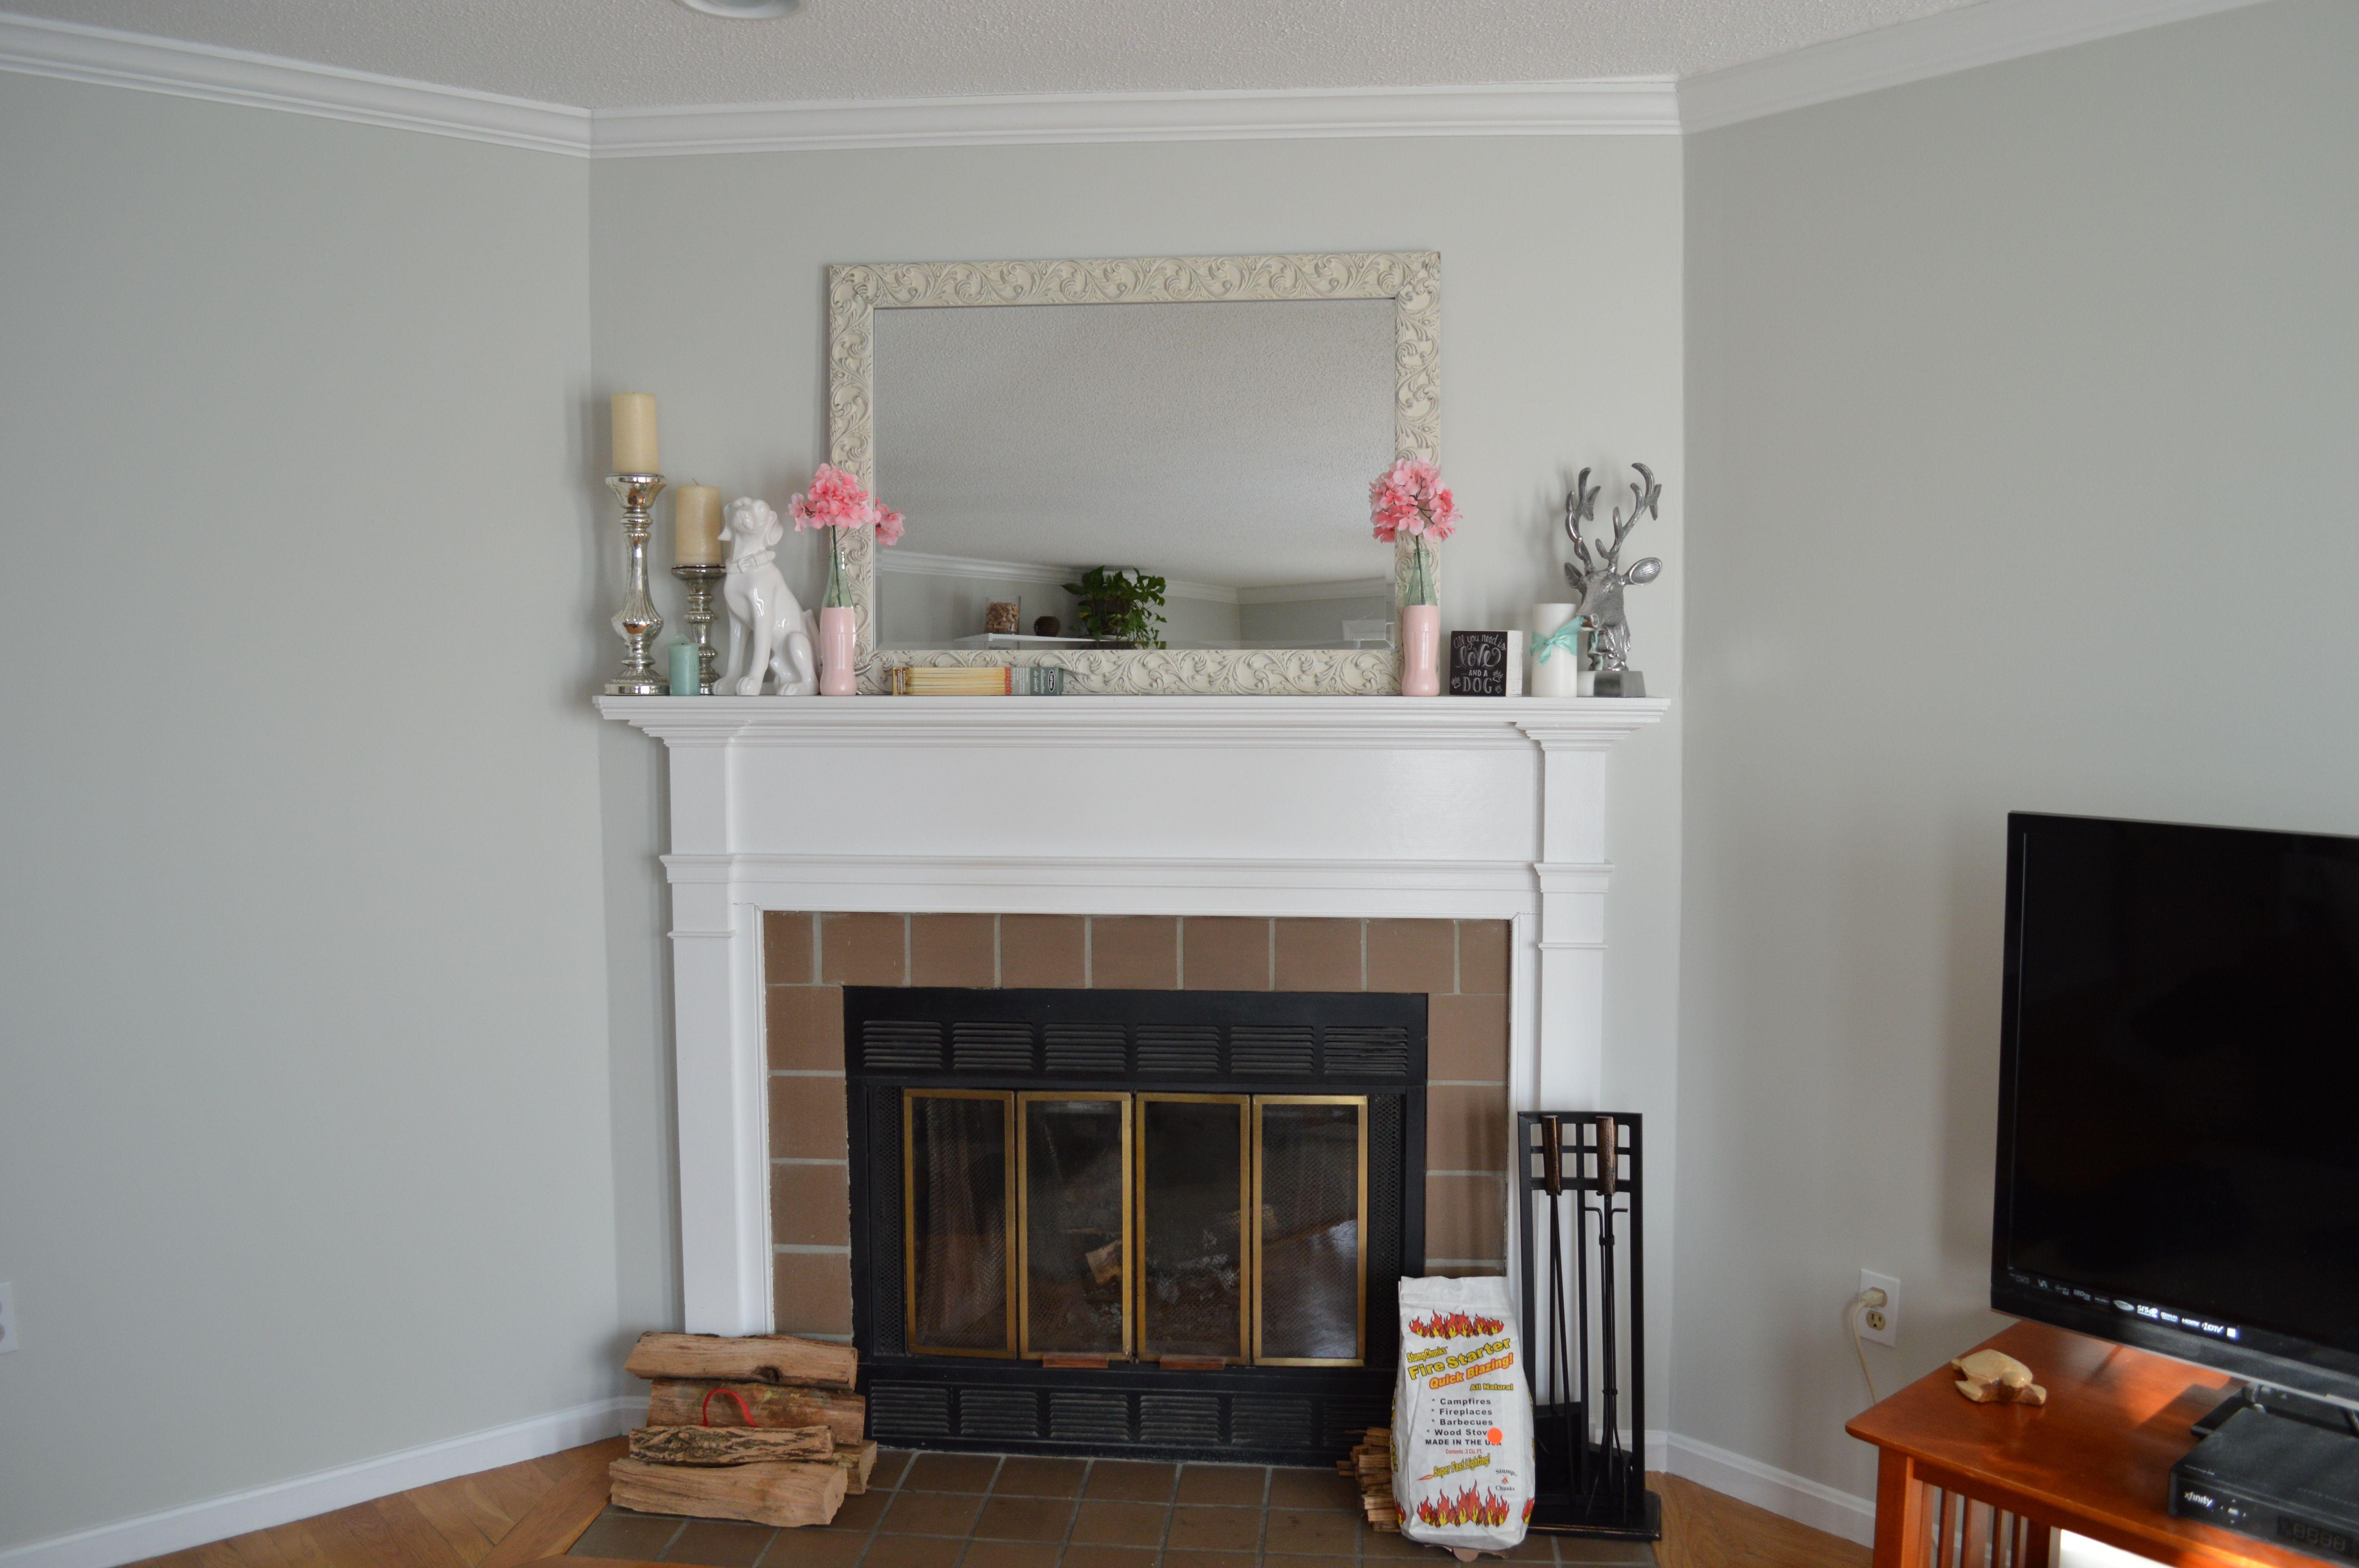 dsc 0089 paint colors benjamin moore benjamin moore. Black Bedroom Furniture Sets. Home Design Ideas